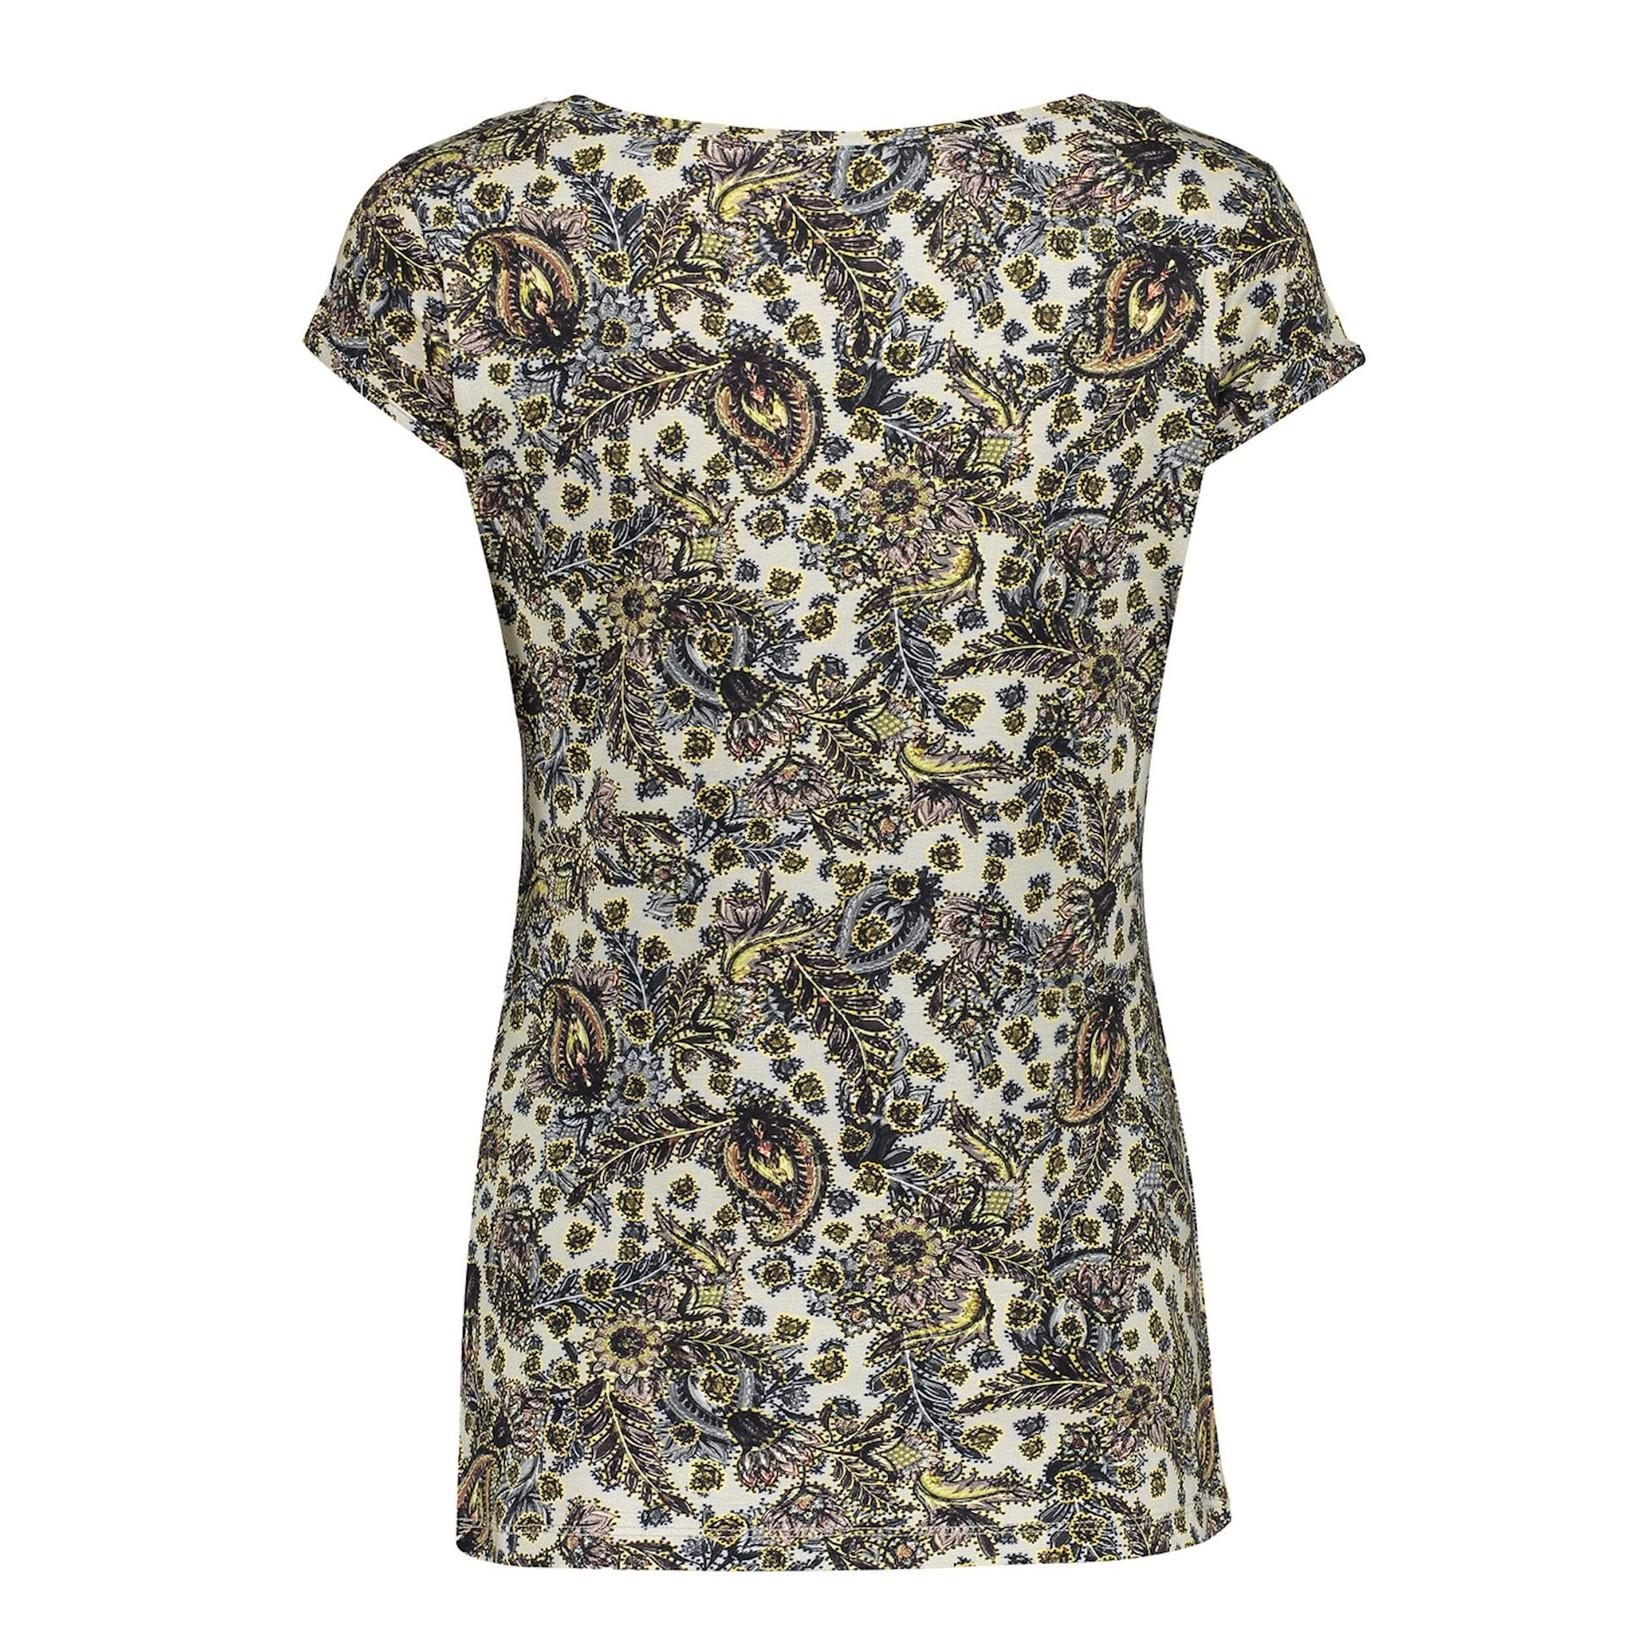 Geisha Geisha t-shirt short sleeve Brown/yellow 12130-60 KATE